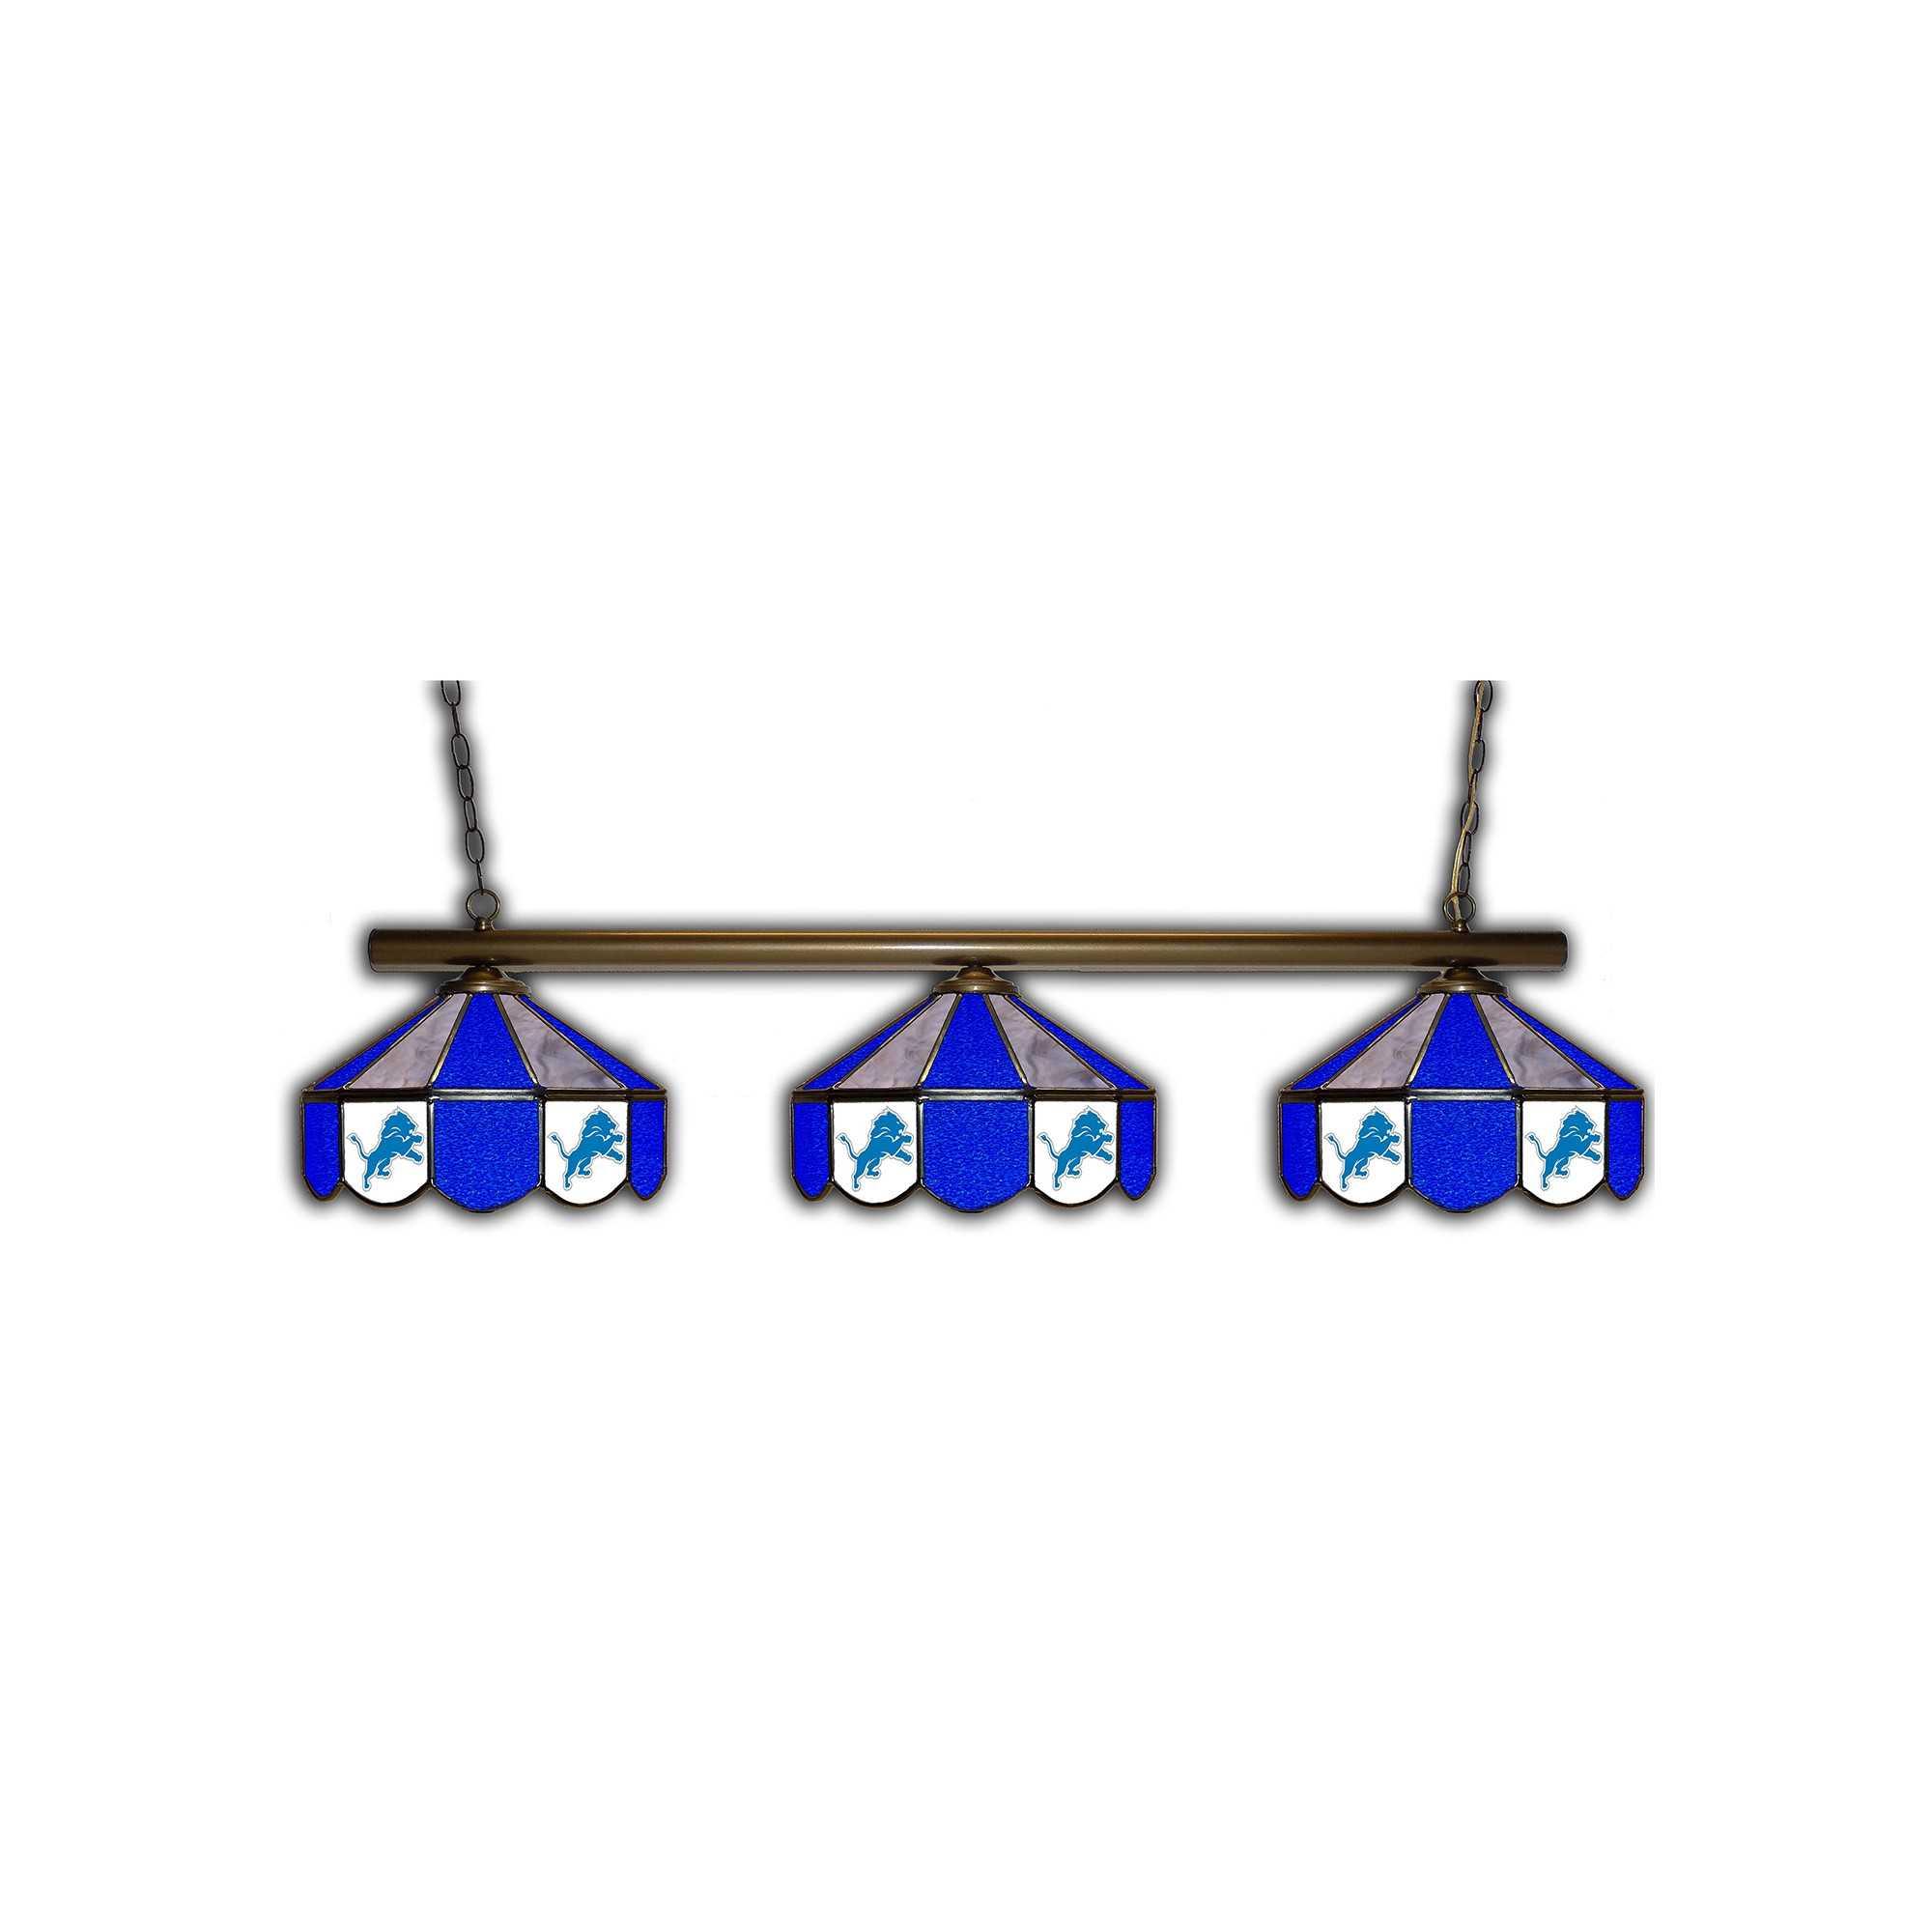 DETROIT LIONS GLASS 3 SHADE LAMP (BAR)